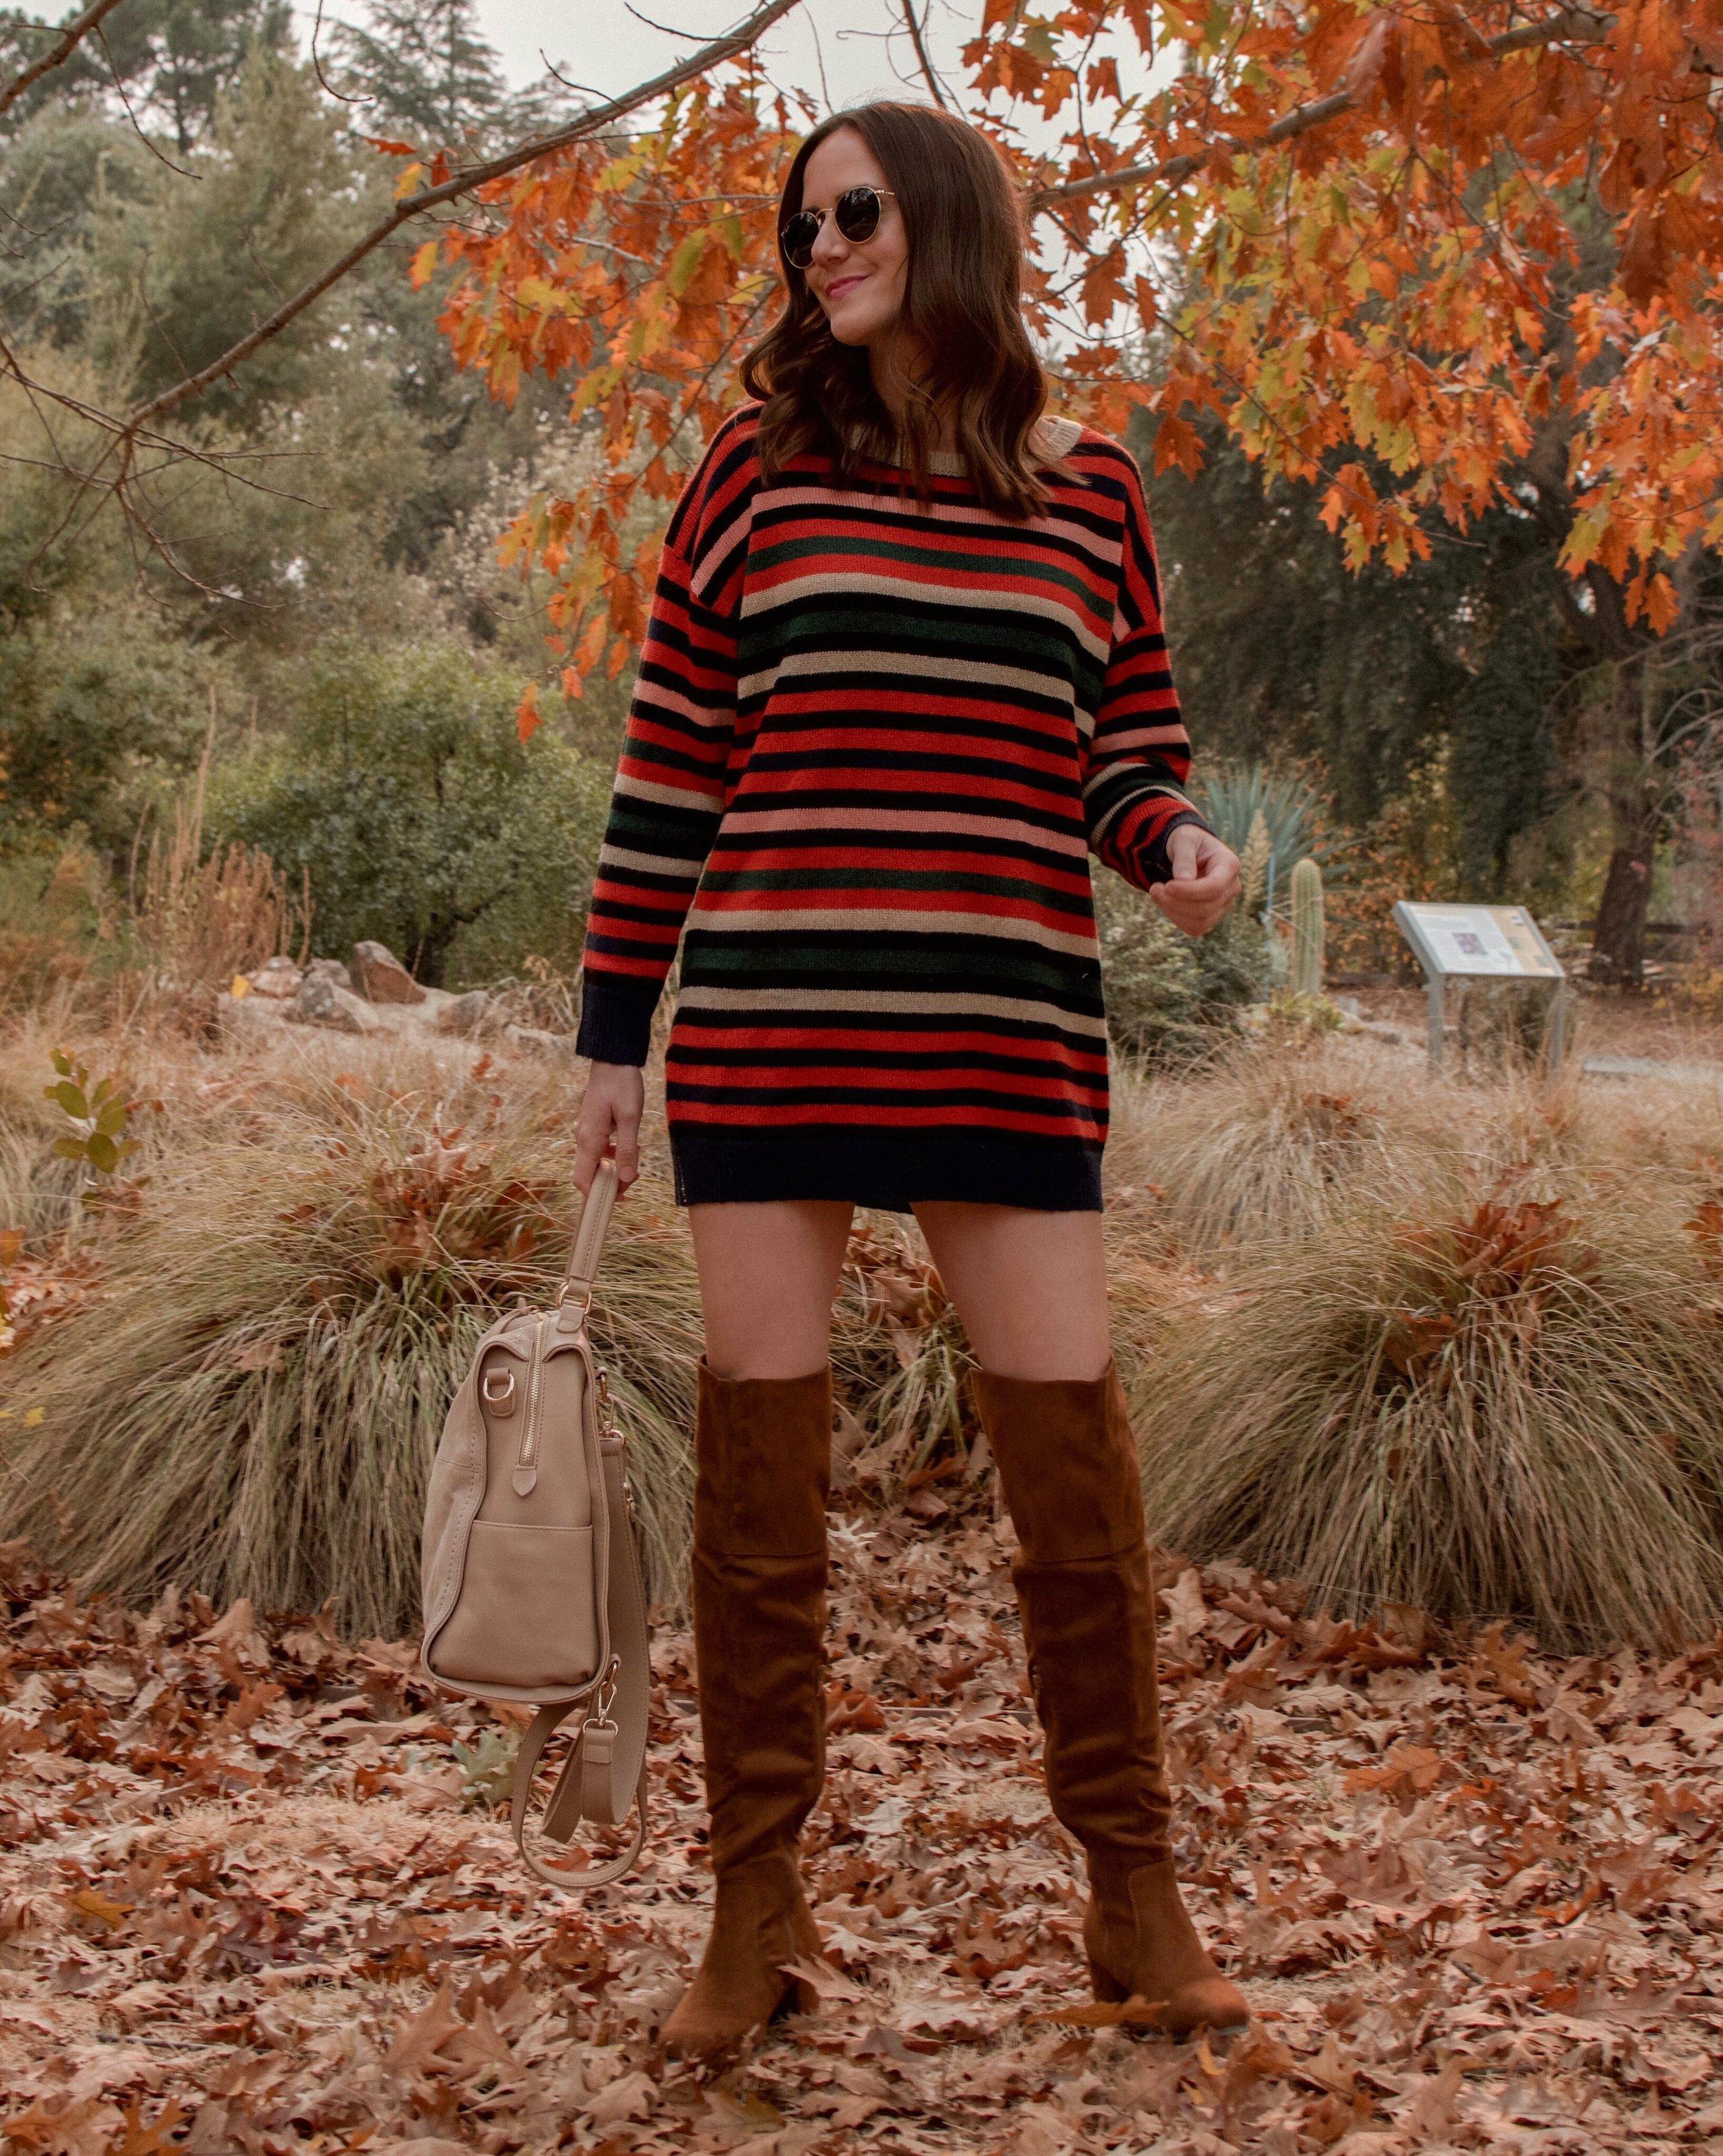 Shop the Look:  Vici Sweater Dress  c/o |  Vici Boots  c/o |  Vici Backpack  c/o |  Ray-Ban Sunglasses